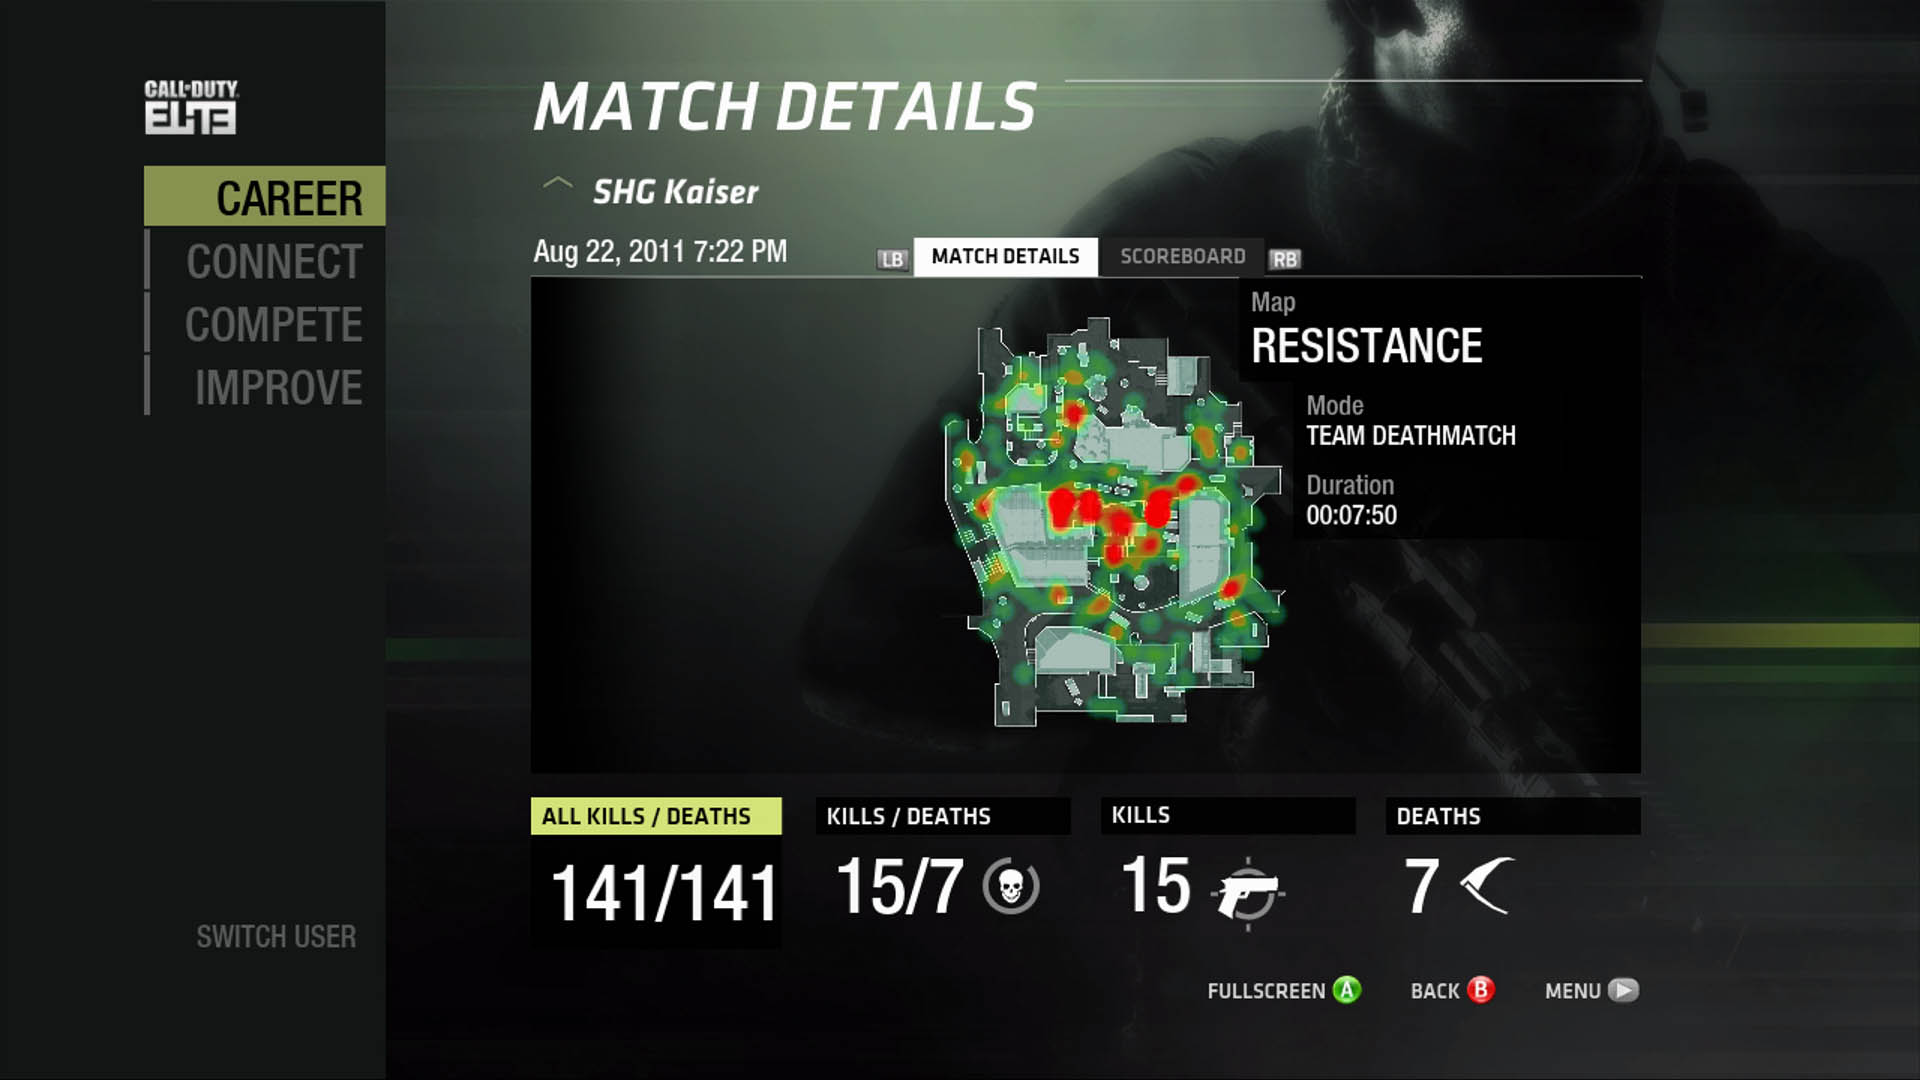 Call of Duty Elite láká v novém videu 50861